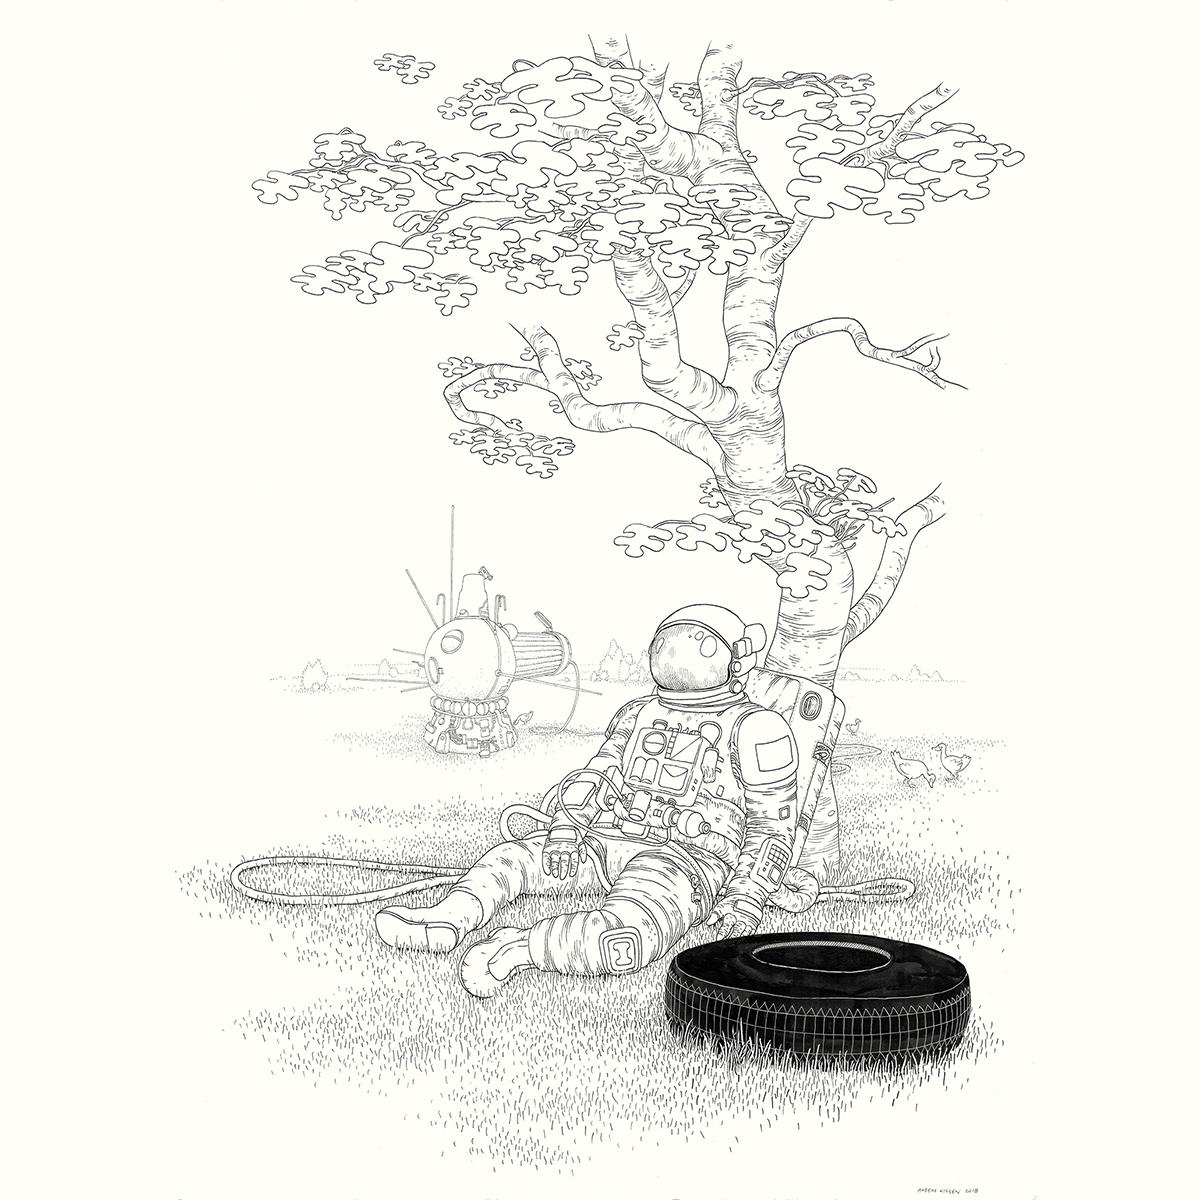 Astronaut with Ducks